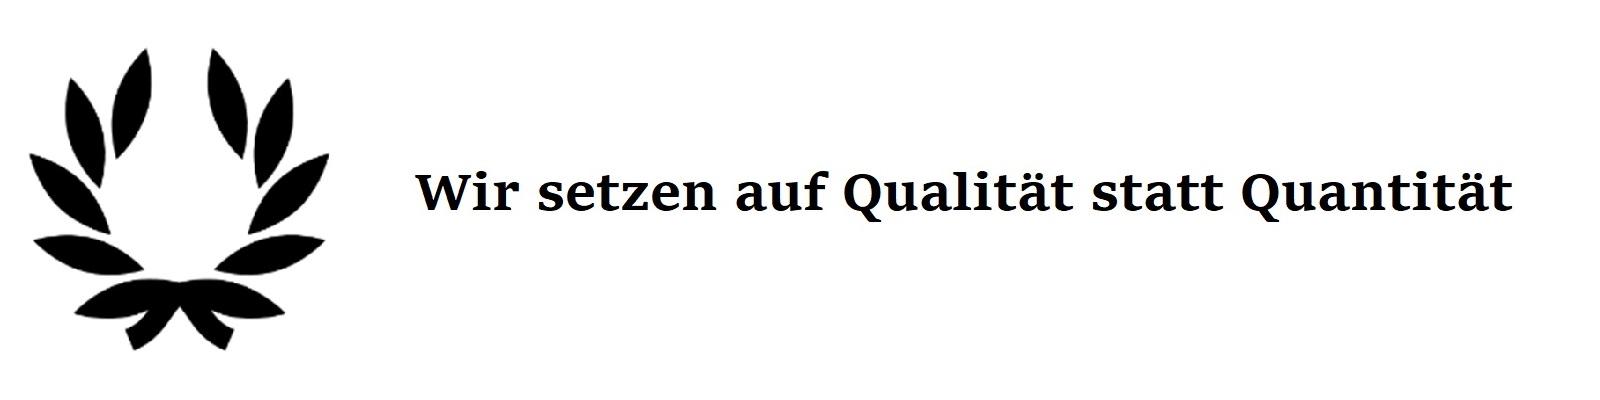 x_qualit-tSuX3Ef5dYOlbx